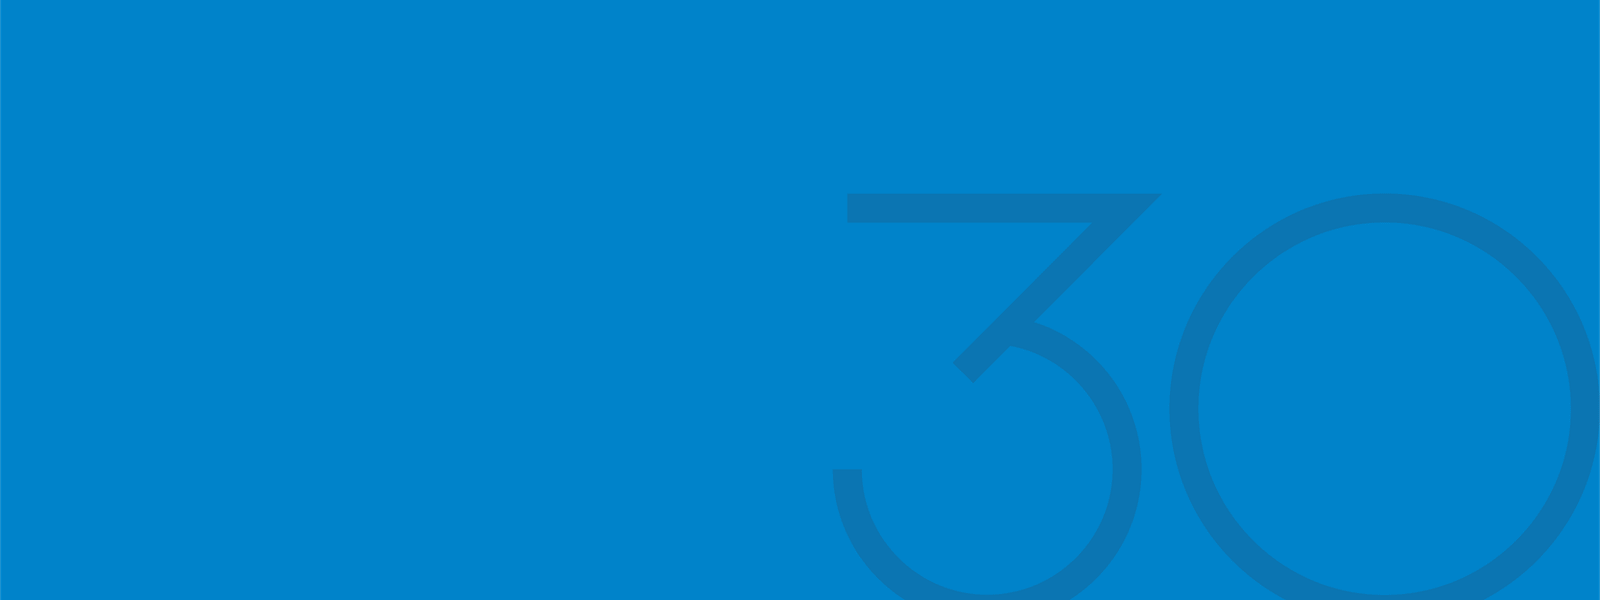 Website Headers_6t30 - Light Blue 4